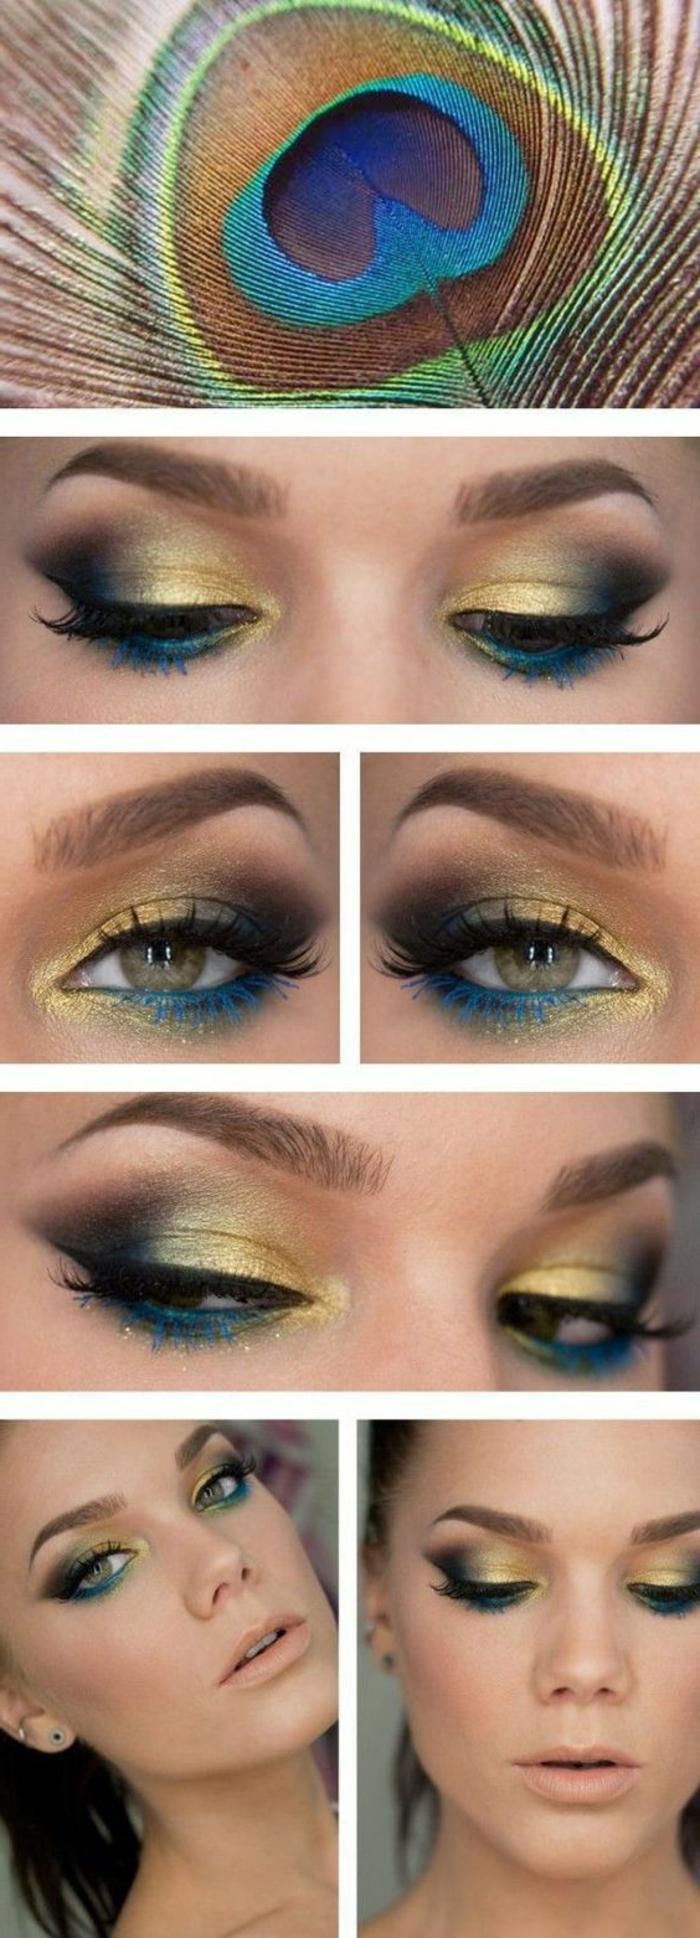 ojos-ahumados-en-tonos-de-pluma-de-pavo-real-oro-azul-negro-lápiz-de-ojos